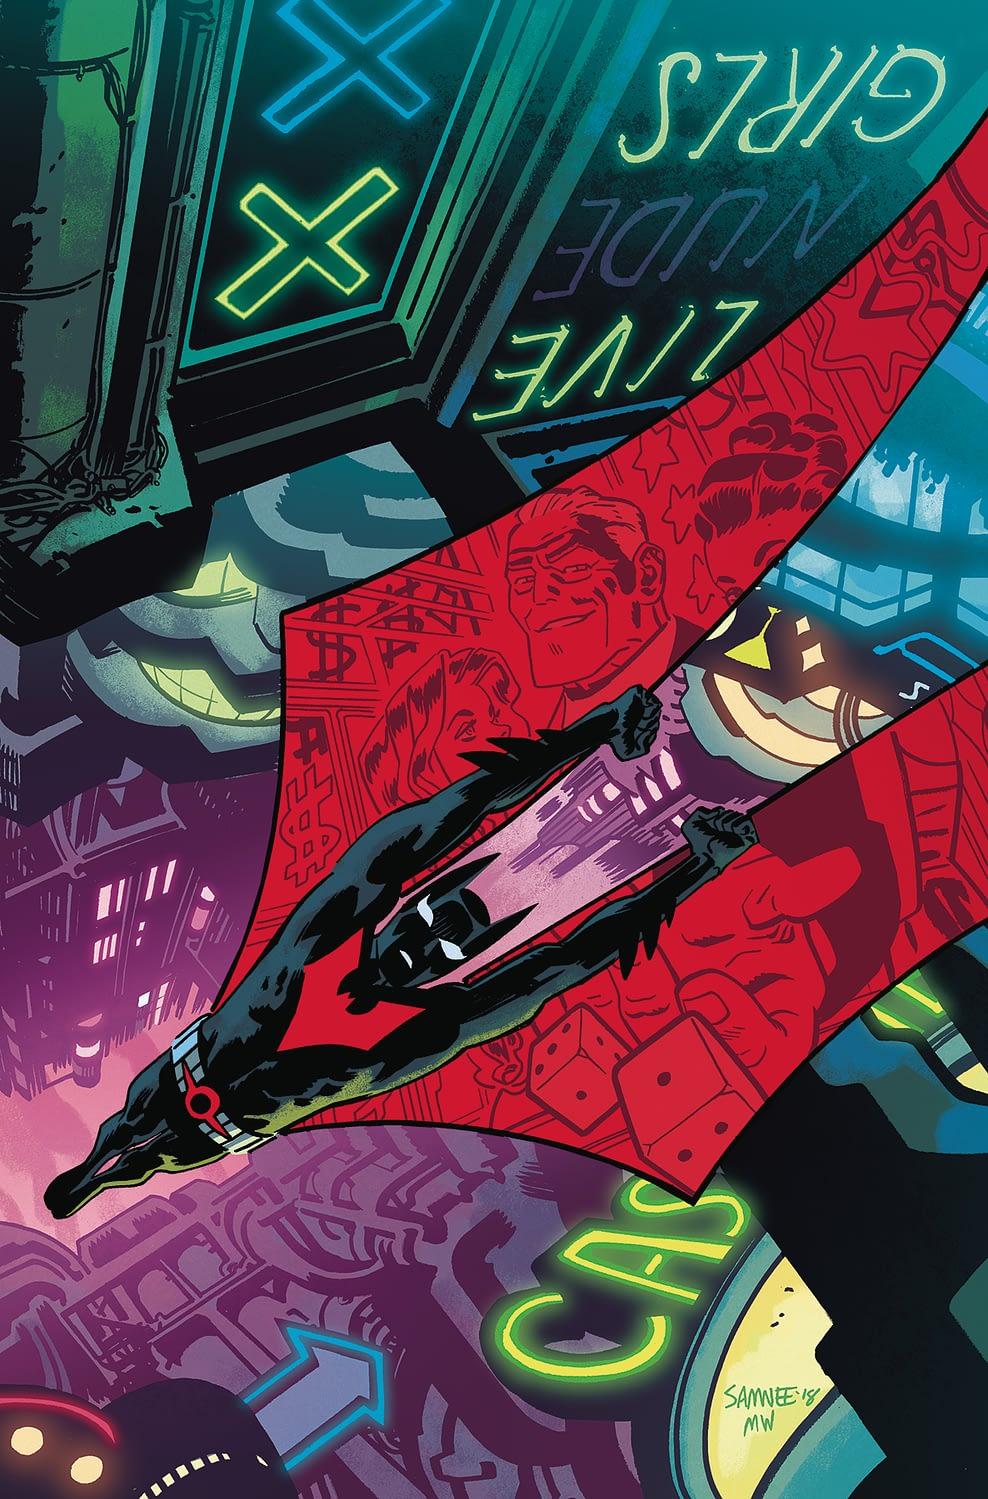 Bruce Wayne is Useless in Batman Beyond #32 (Preview)